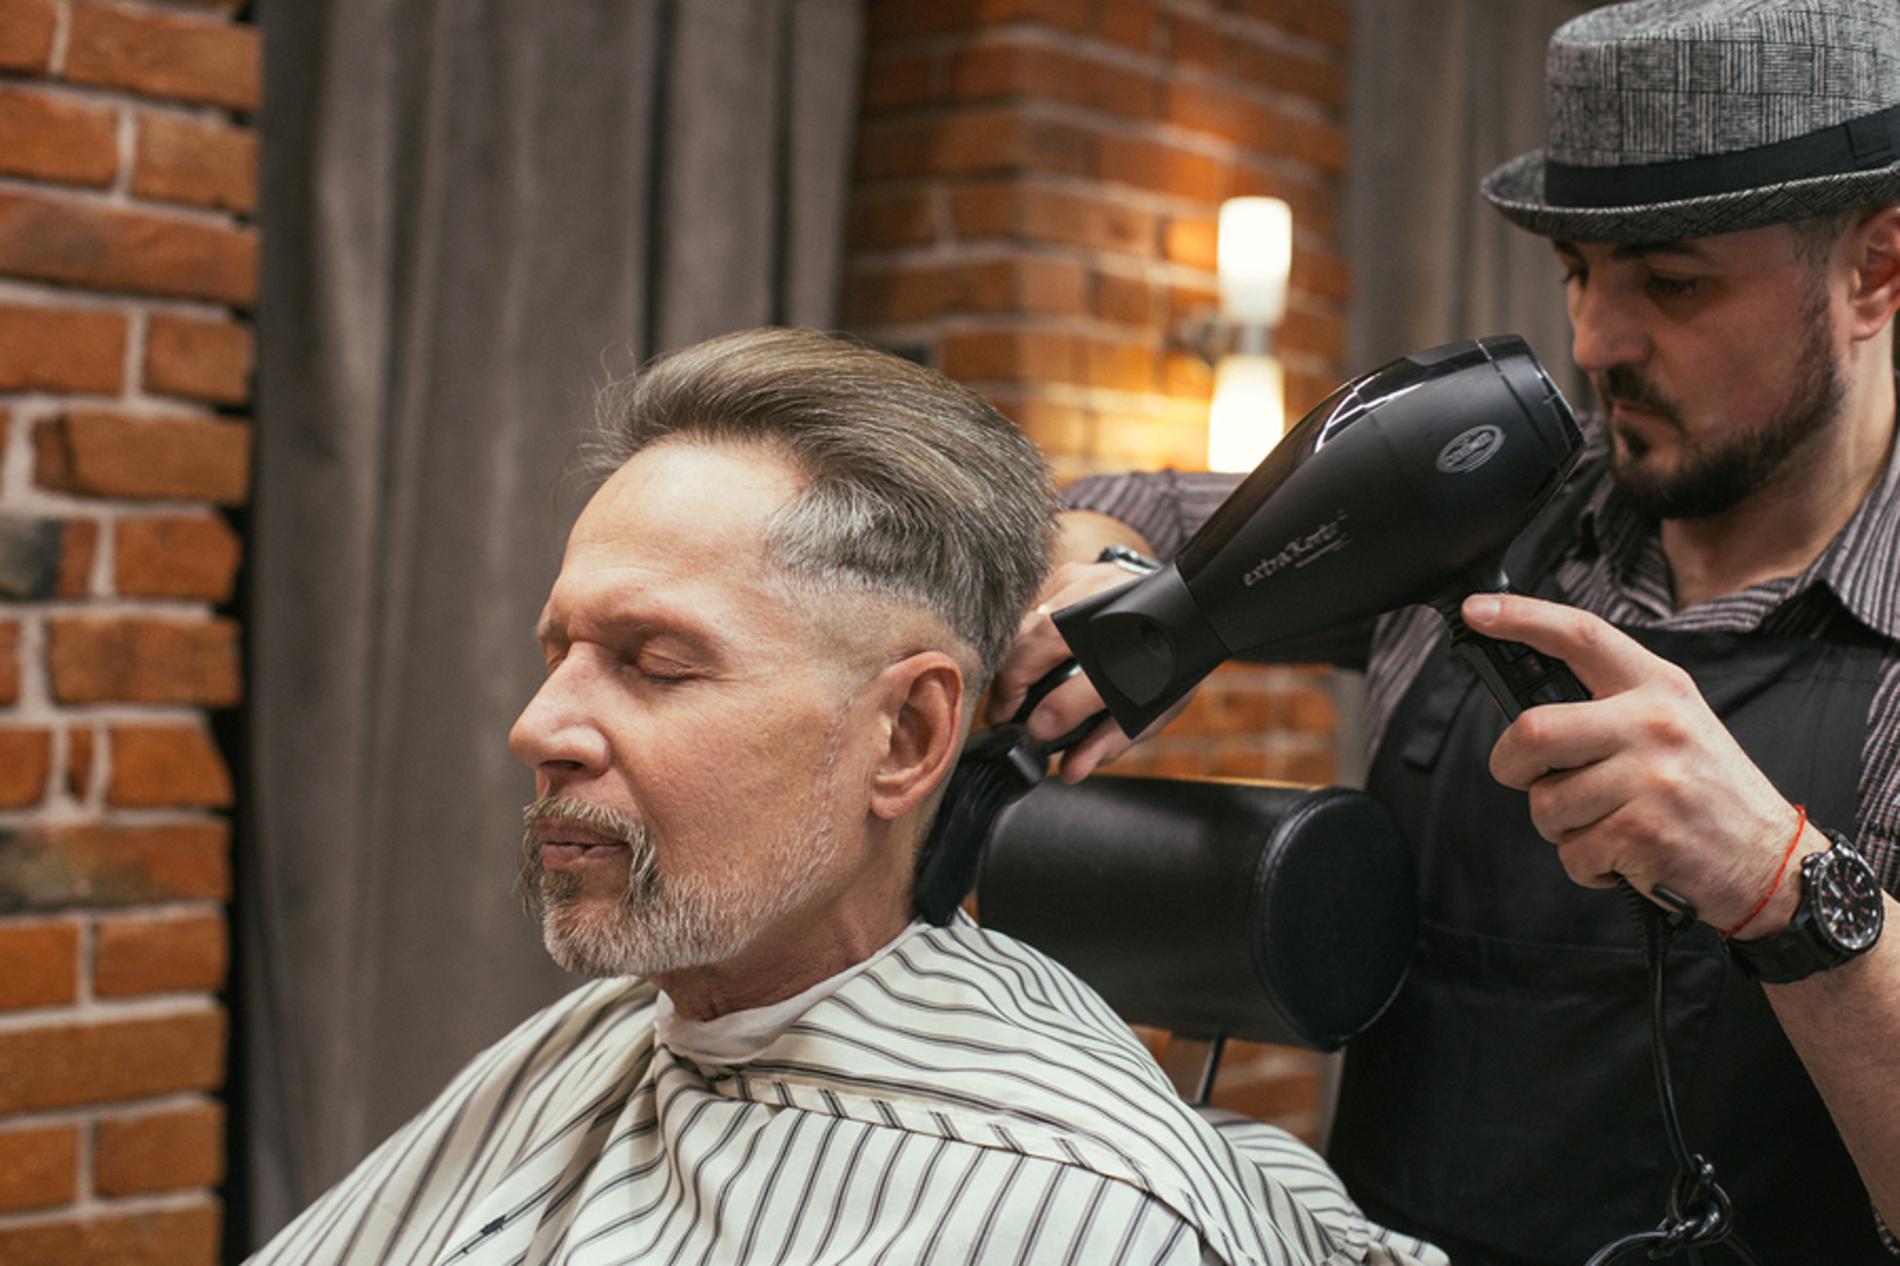 Man getting his hair cut at a barbers.